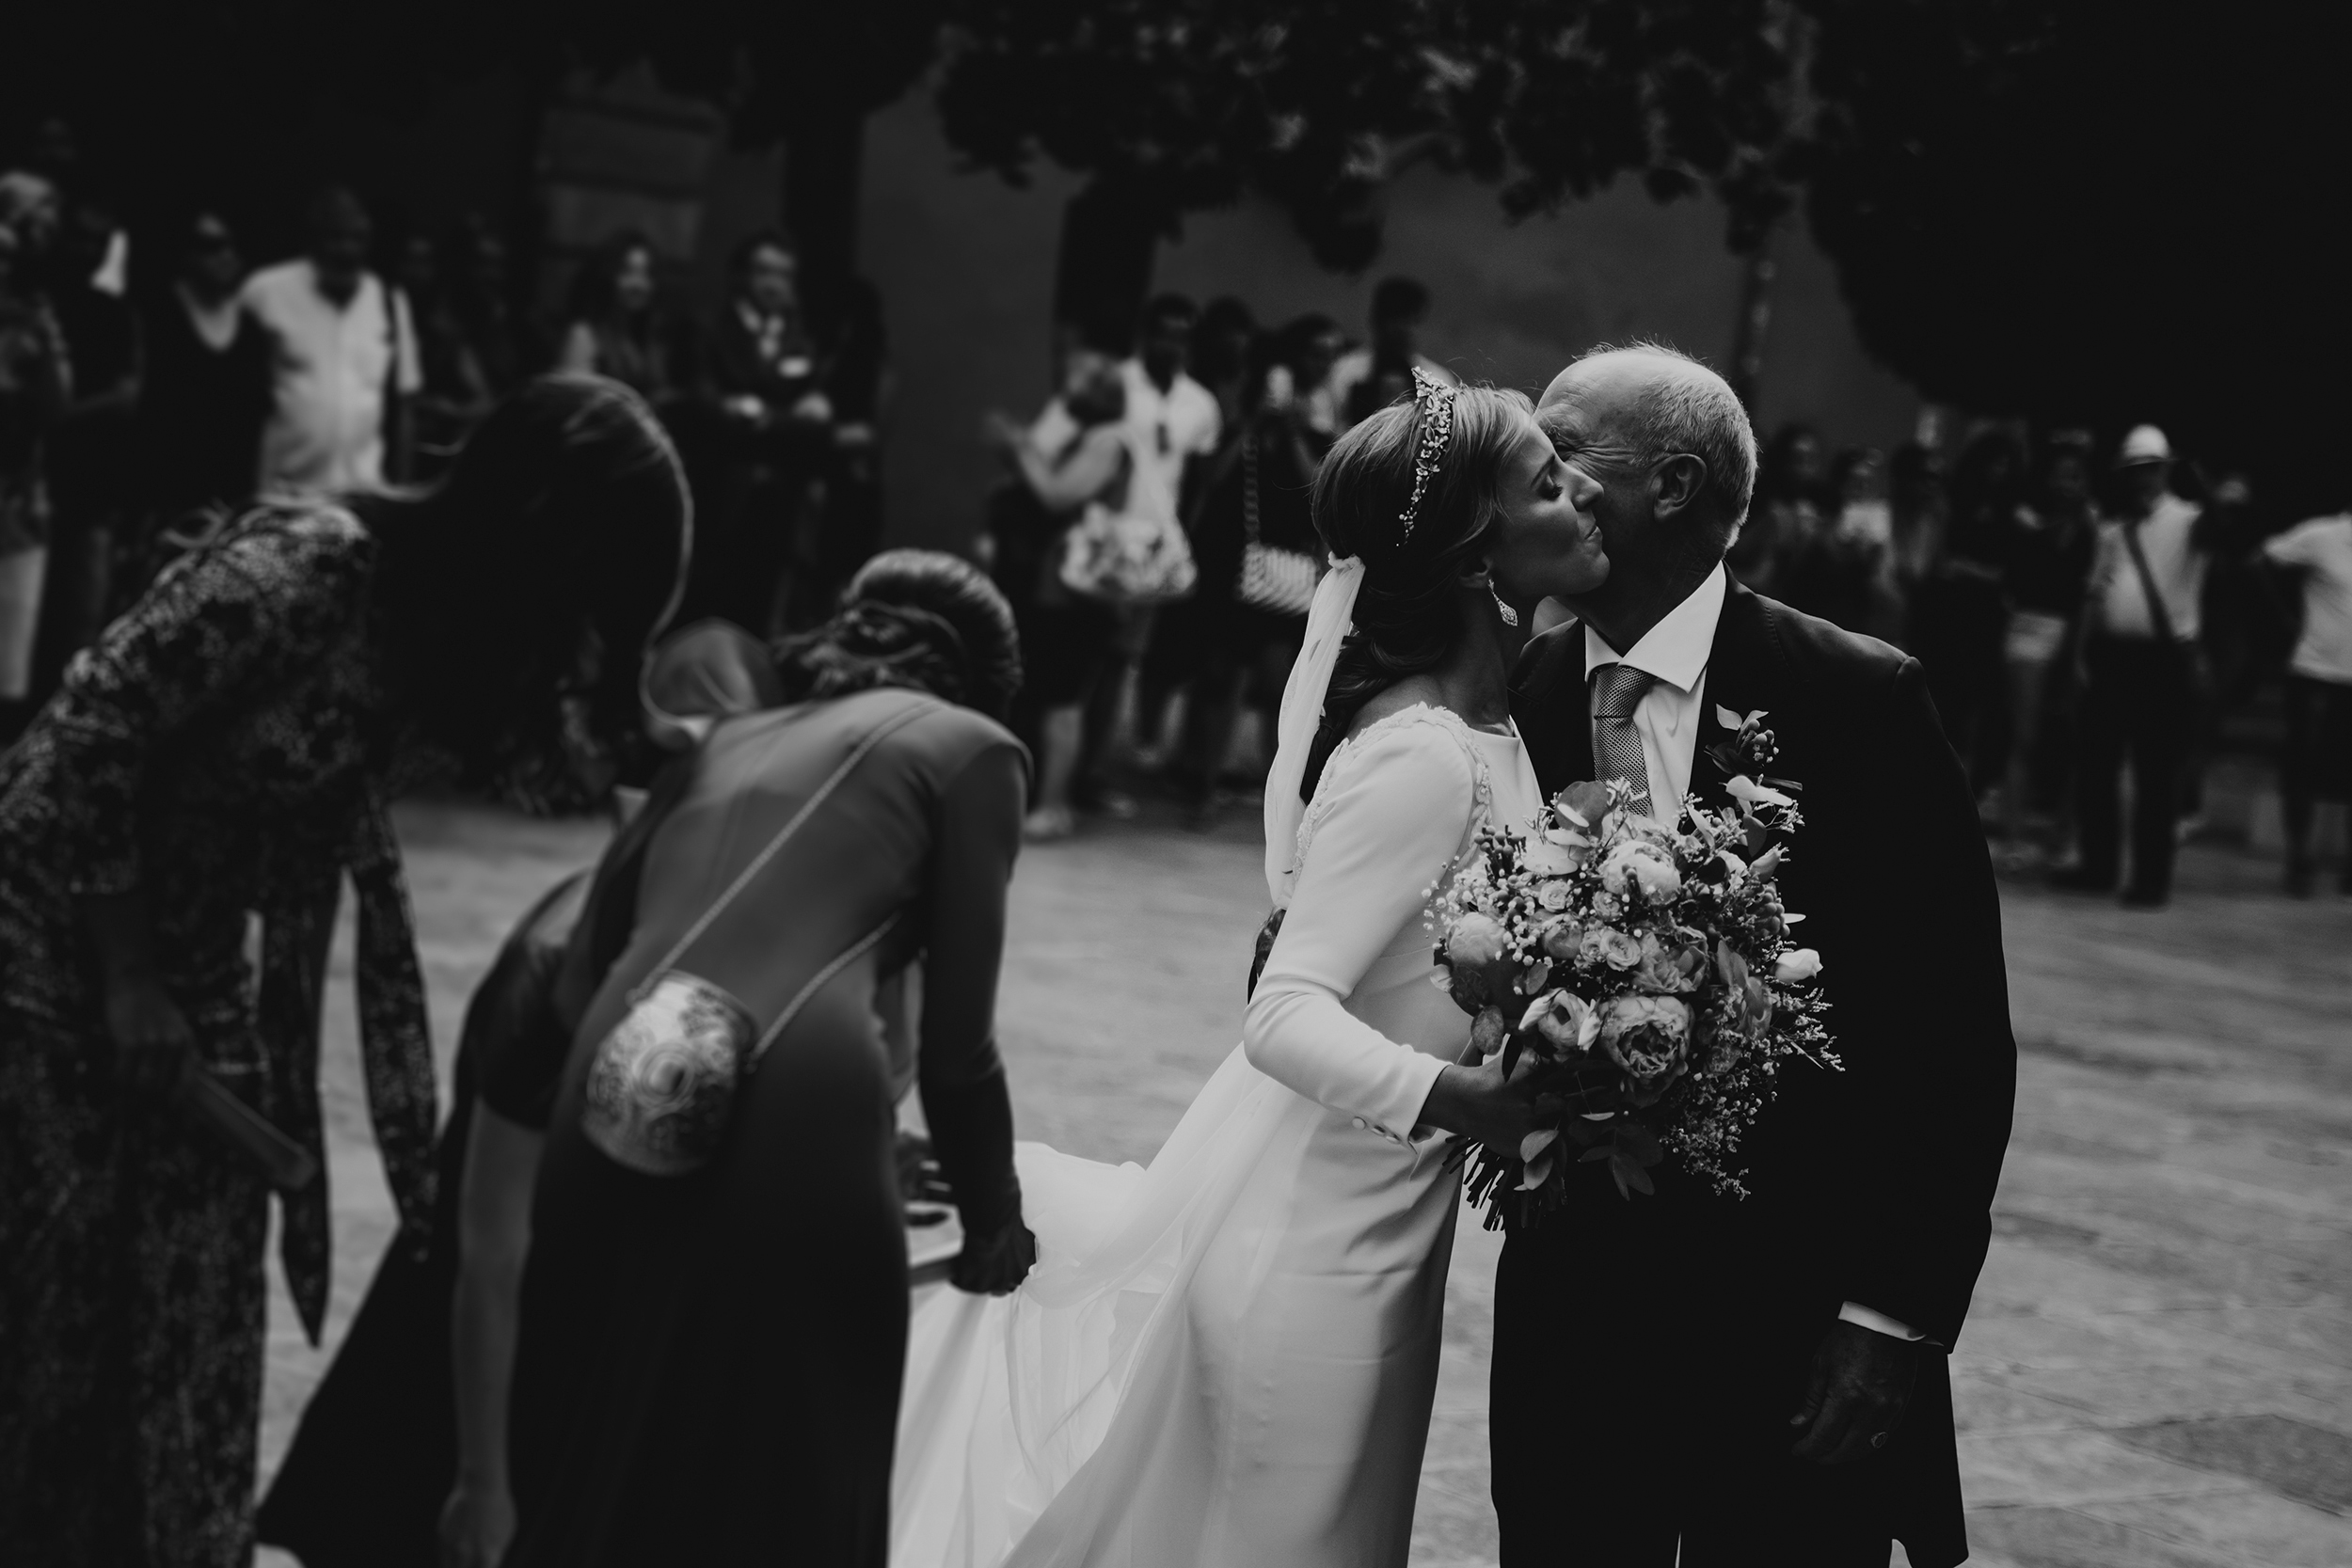 fotografo-bodas-granada-catedral-sagrario-jose-reyes_030.jpg